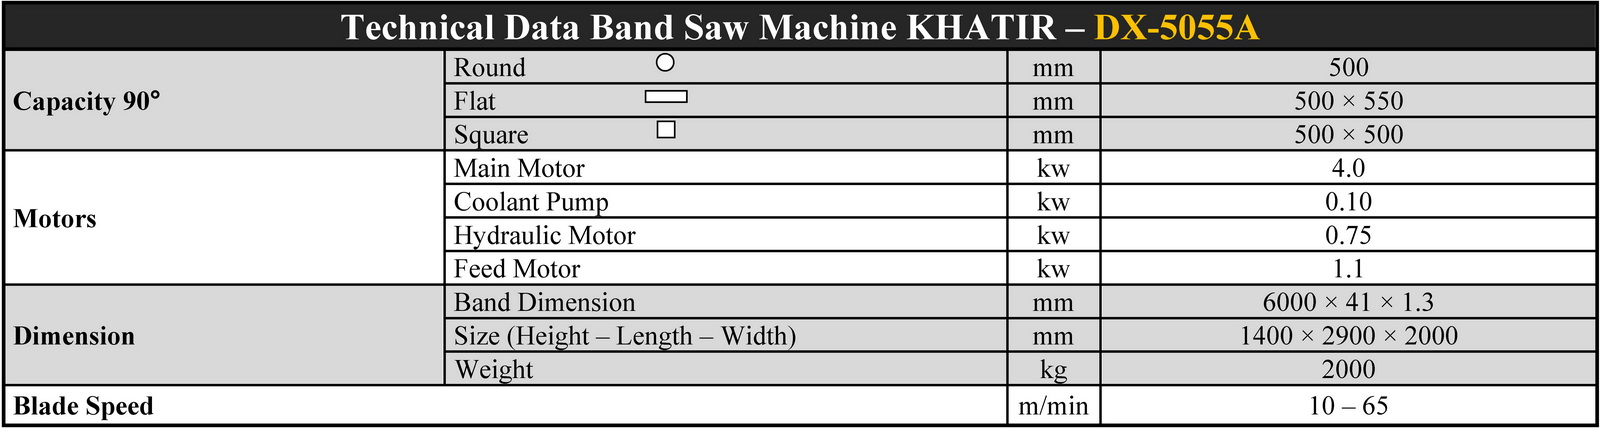 DX 5055A - مشخصات فنی دستگاه اره نواری دو ستون اتوماتیک خطیر